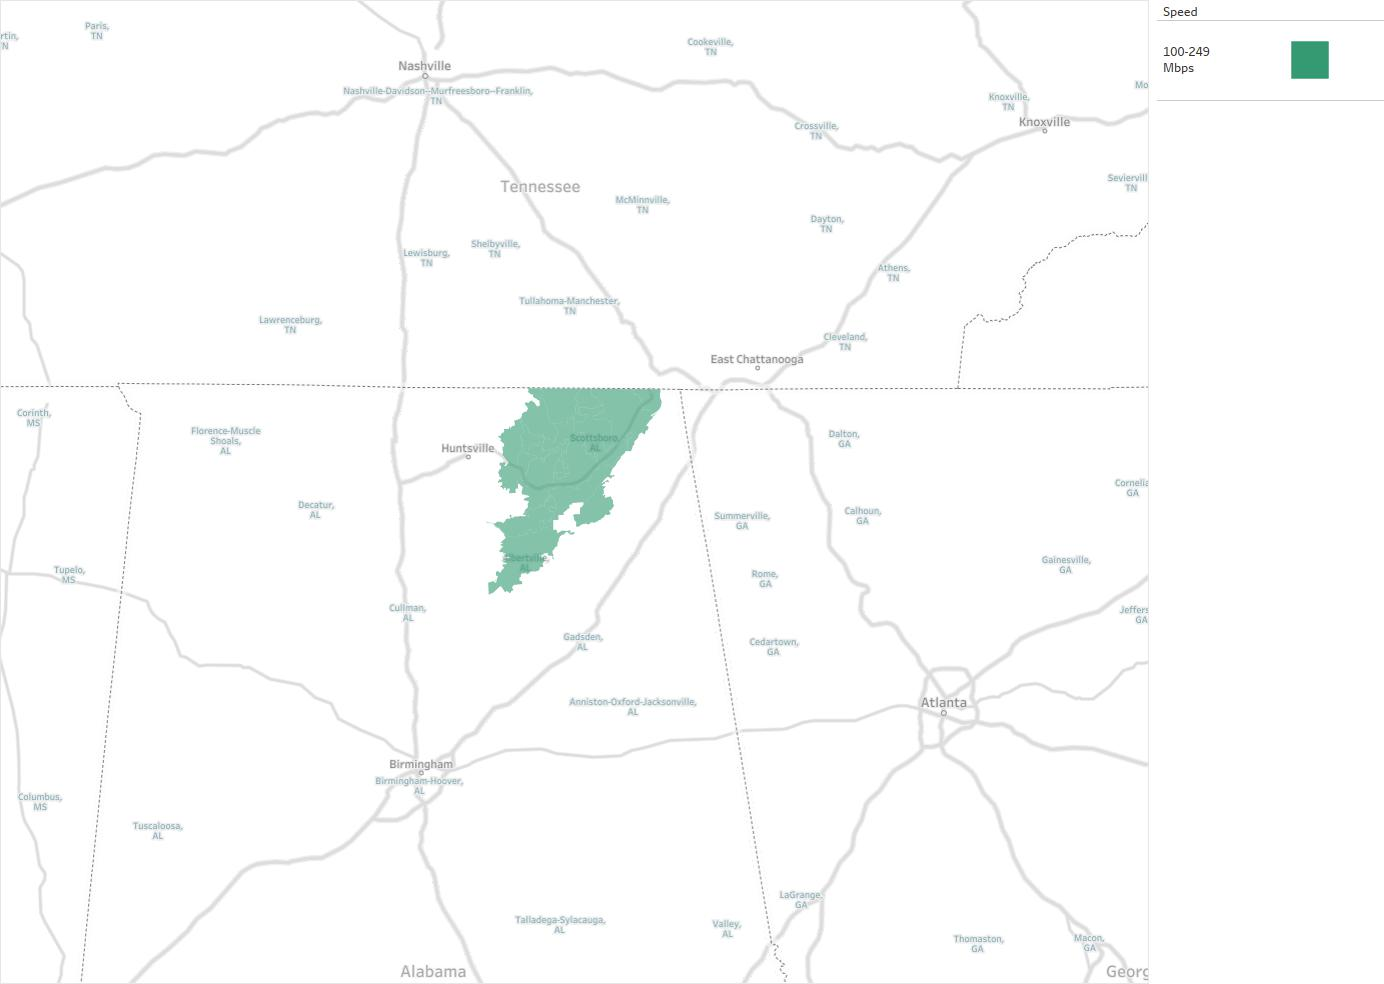 North Alabama Electric Cooperative Availability Areas